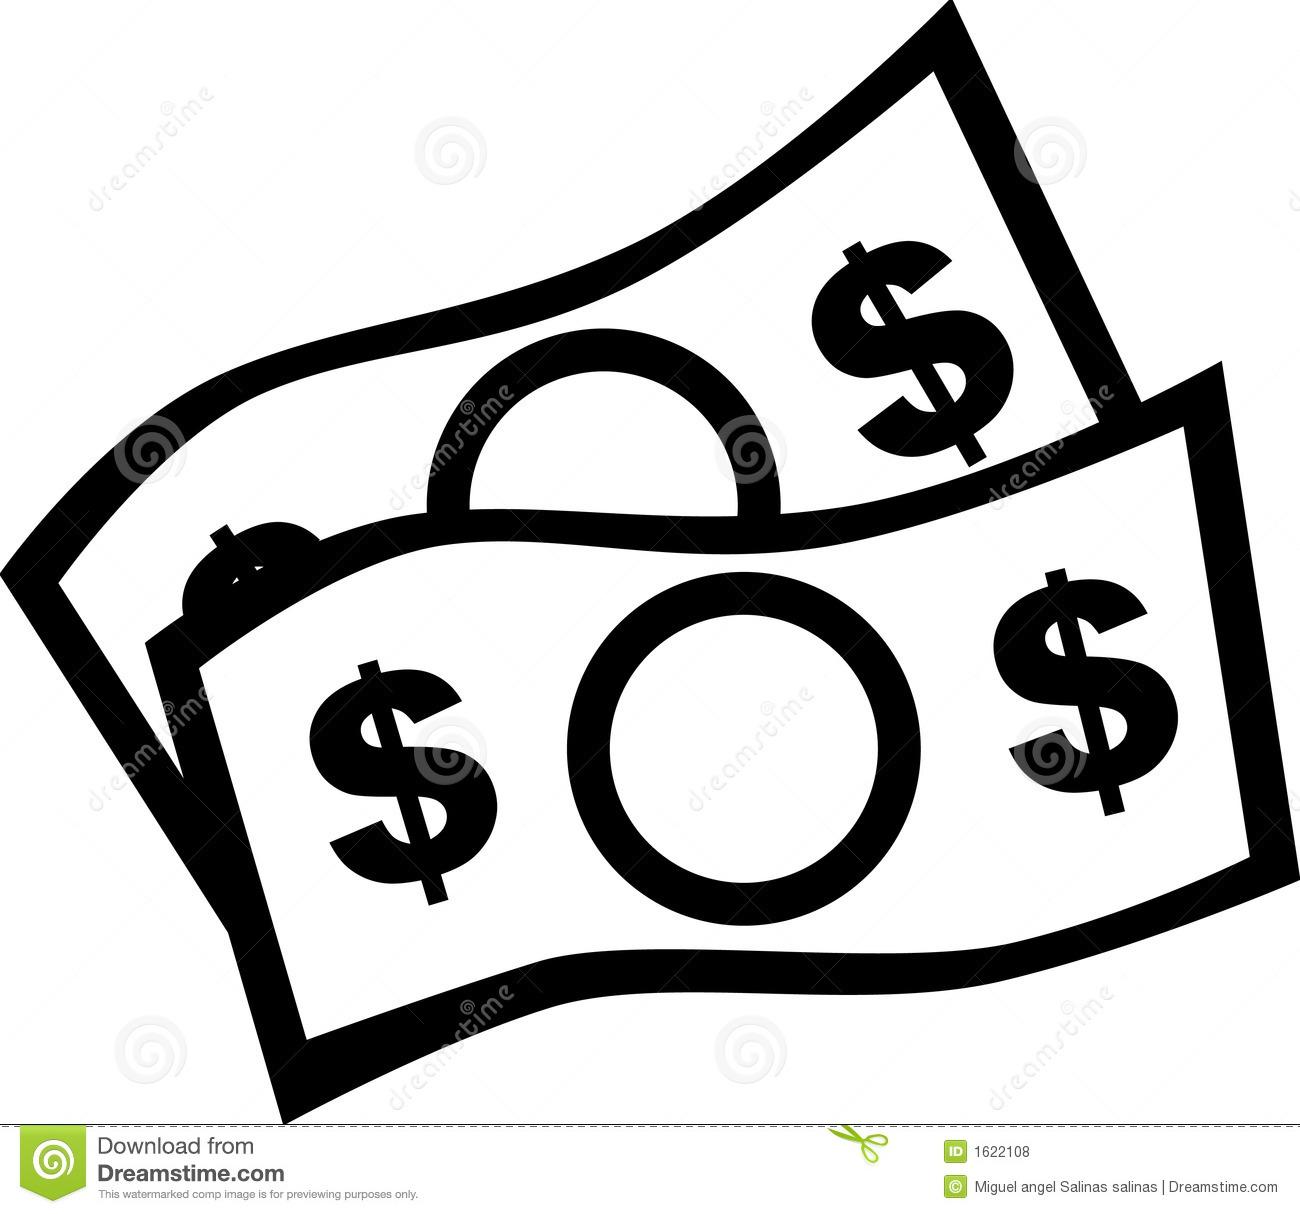 Money Clip Art Black and White Vector